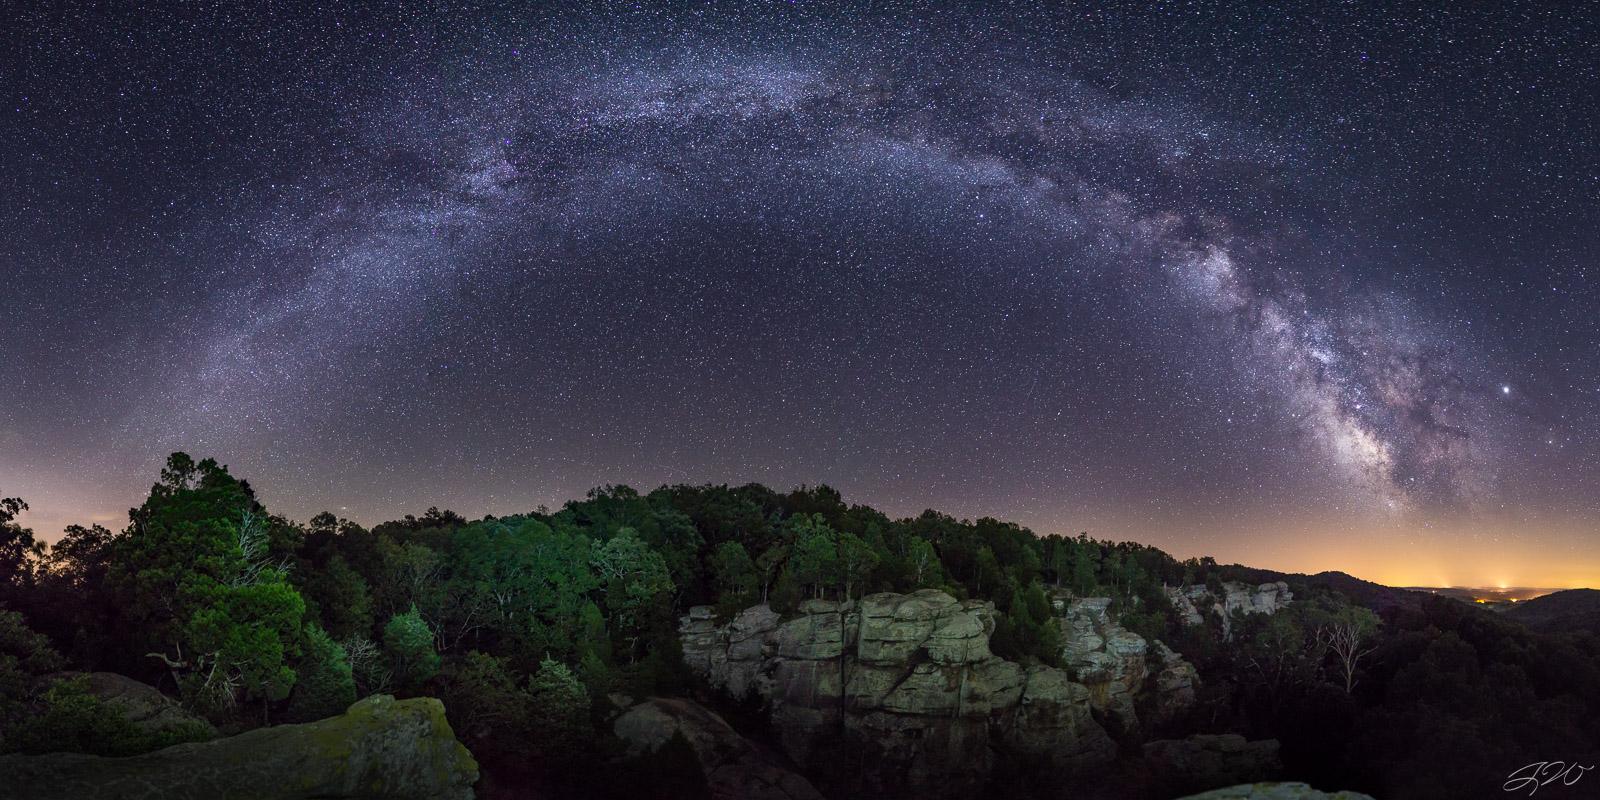 Astrophotography, Fine Art, Garden of the Gods, Illinois, Jared Weber, Milky Way, Nightscape, Panorama, Shawnee National Forest, Stars, photo